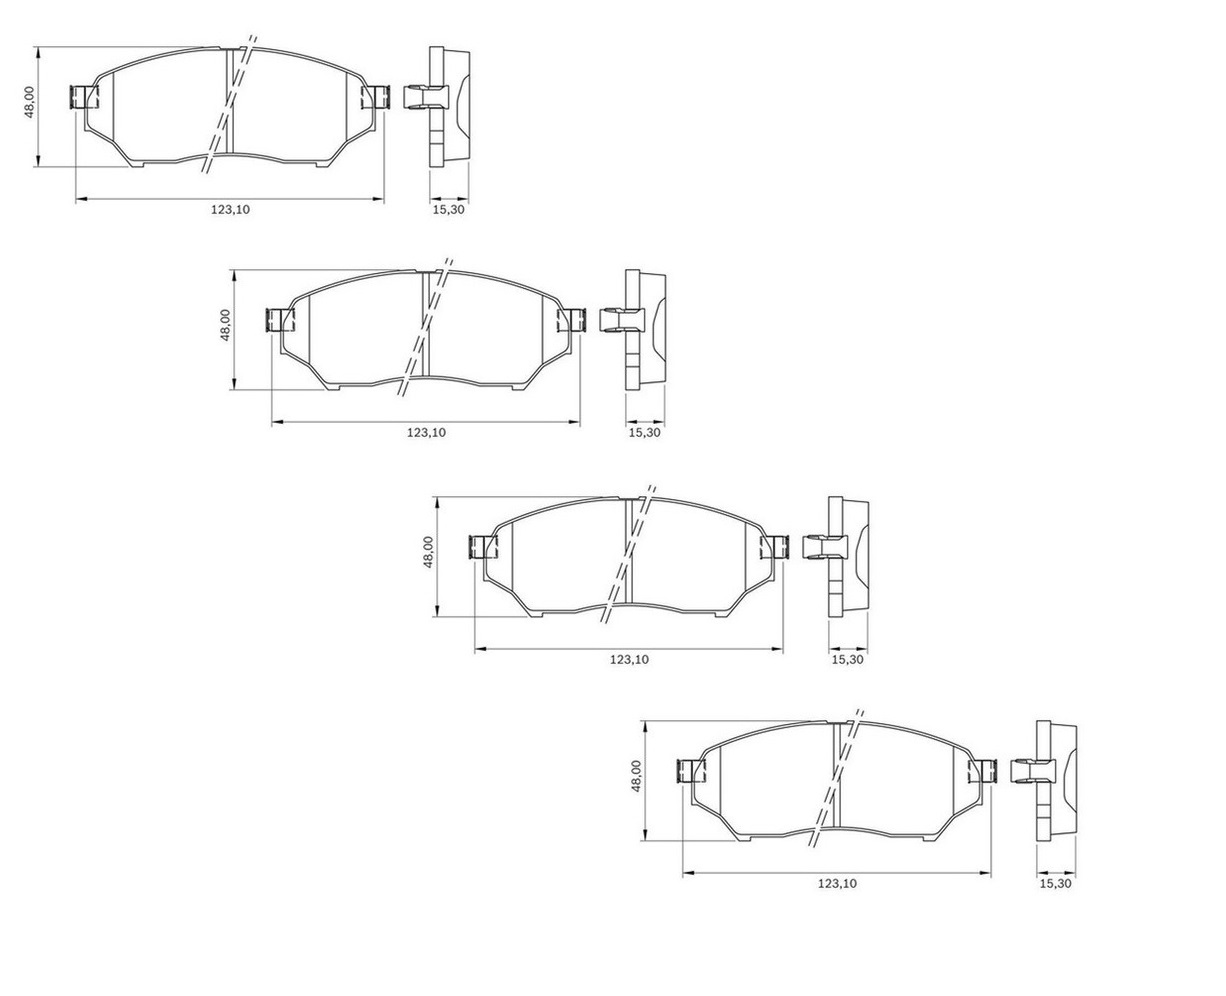 Pastilha Dianteiro Mitsubishi Tr4 2.0 2007 a 2015 Bosch